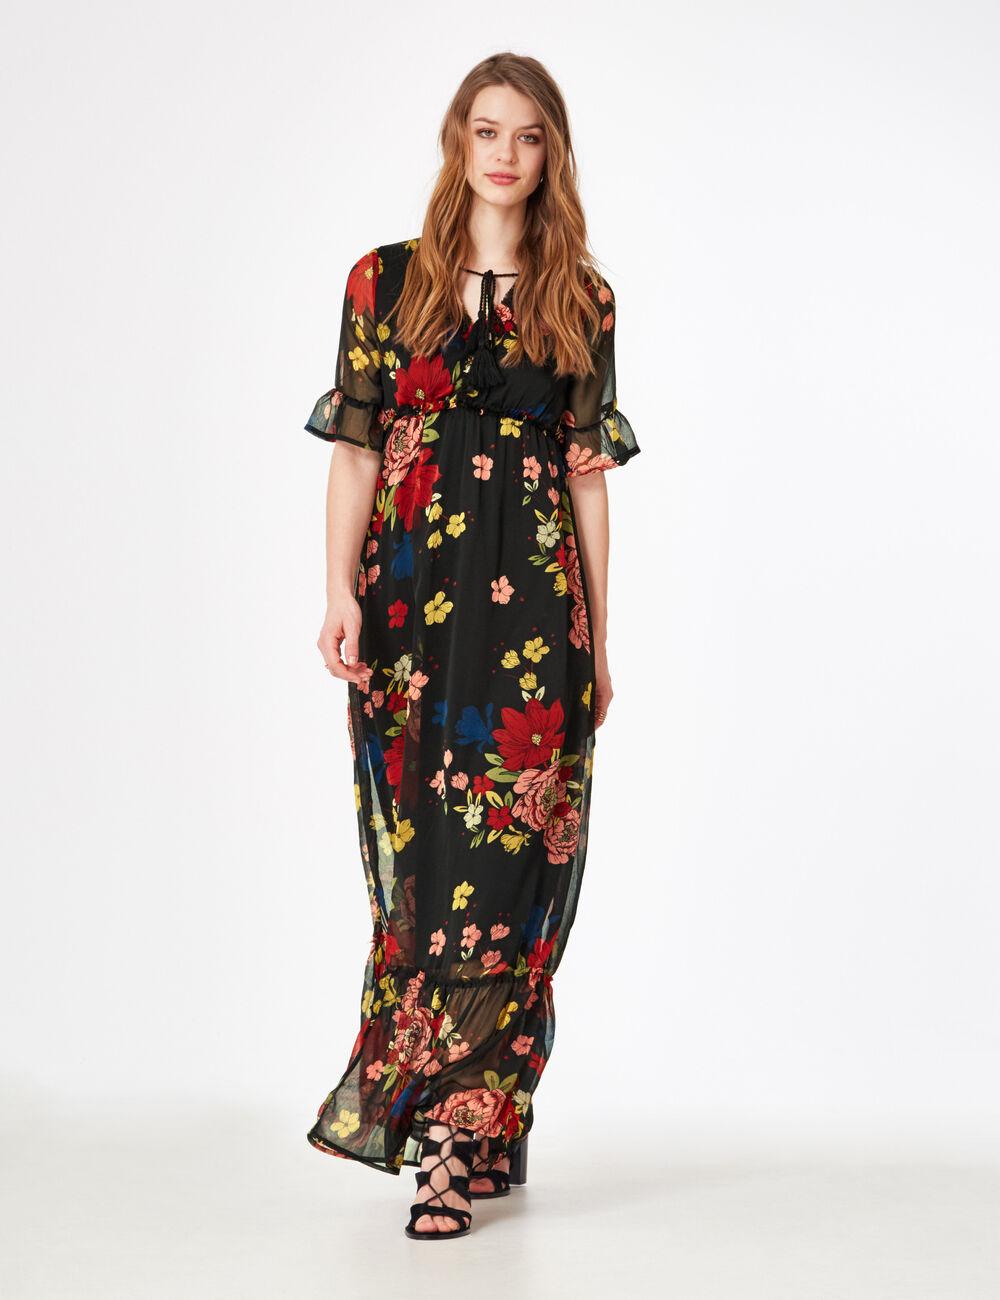 2601b9c7204 Robes Noire Longue Jennyfer Élégantes Manche – 2019 Robe xqdBXzq